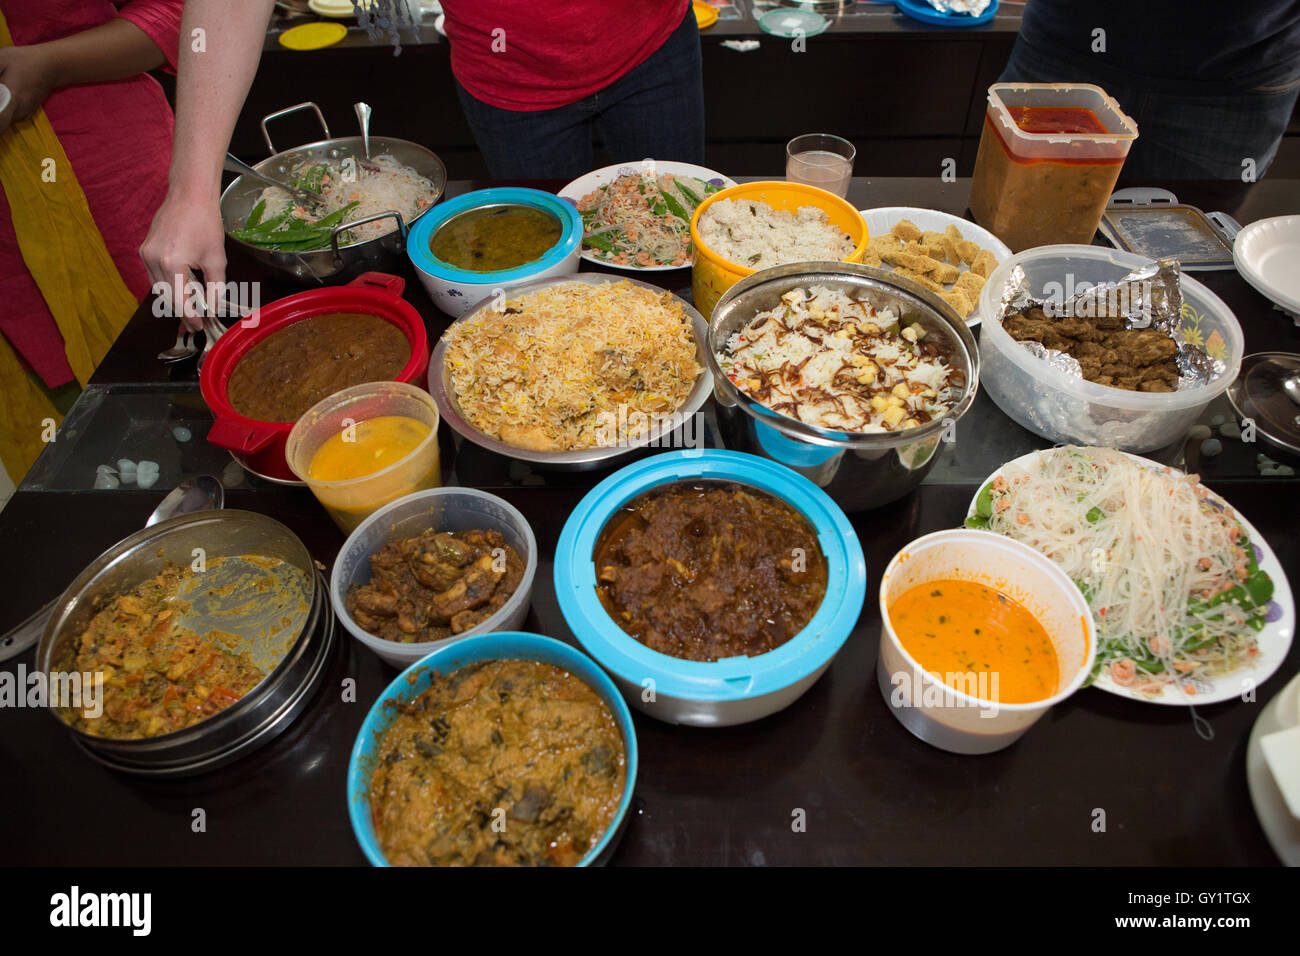 Indian Food Potluck Ideas